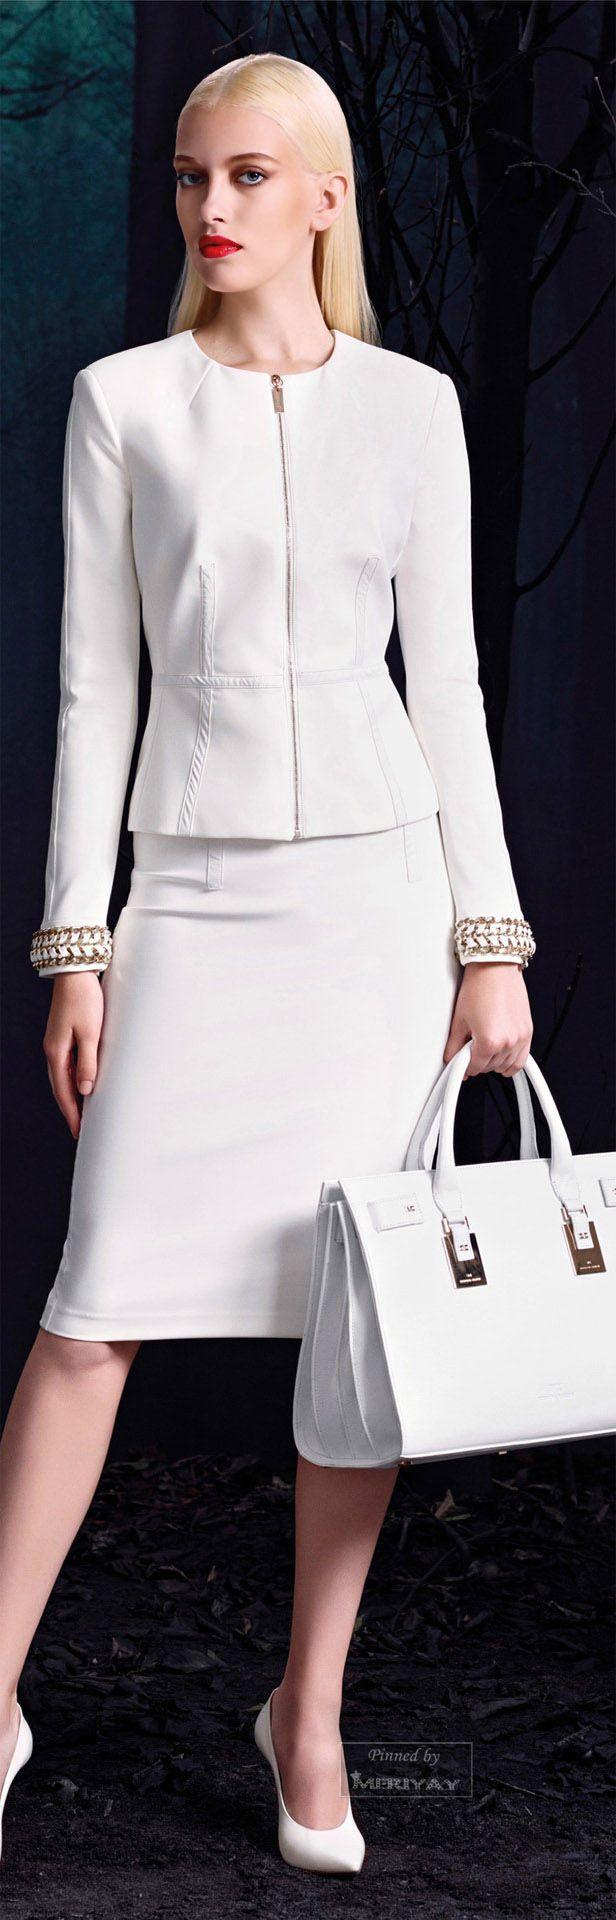 Elisabetta Franchi #Modest doesn't mean frumpy. #DressingWithDignity www.ColleenHammond.com www.TotalimageInstitute.com